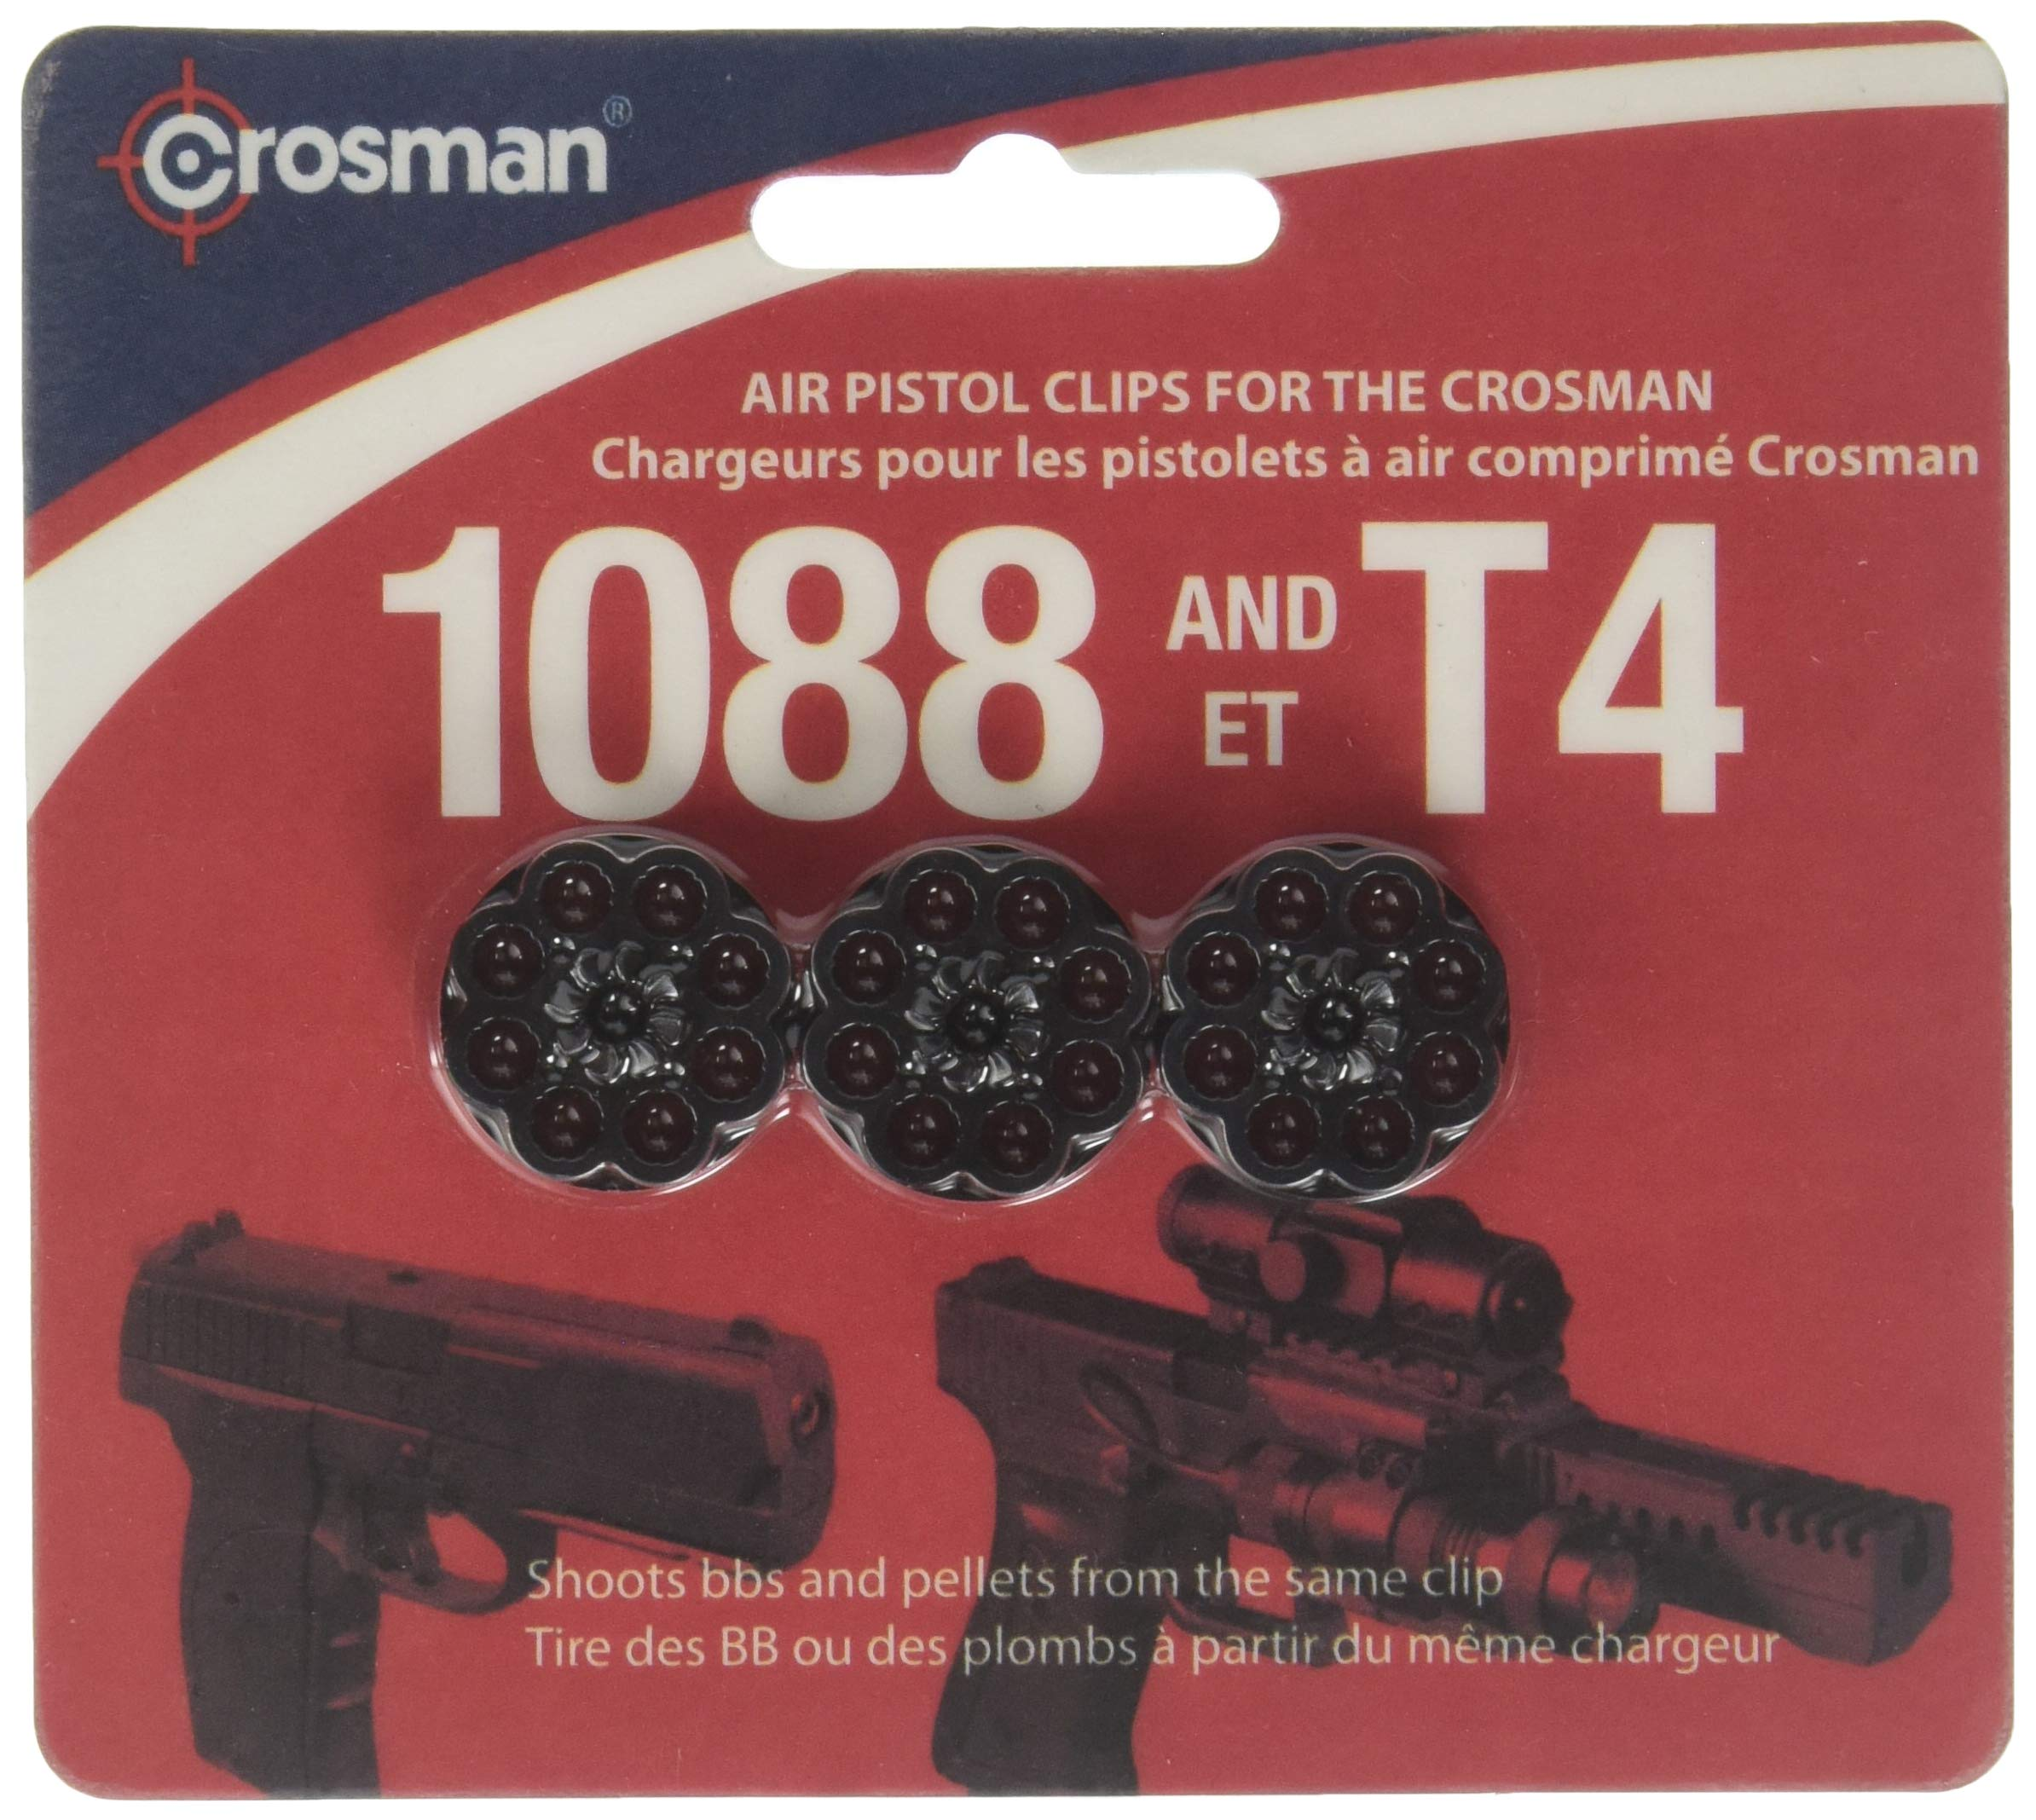 Crosman 8-Shot Rotary Clips, Fits T4 & 1088 Pistols, 3/Pack